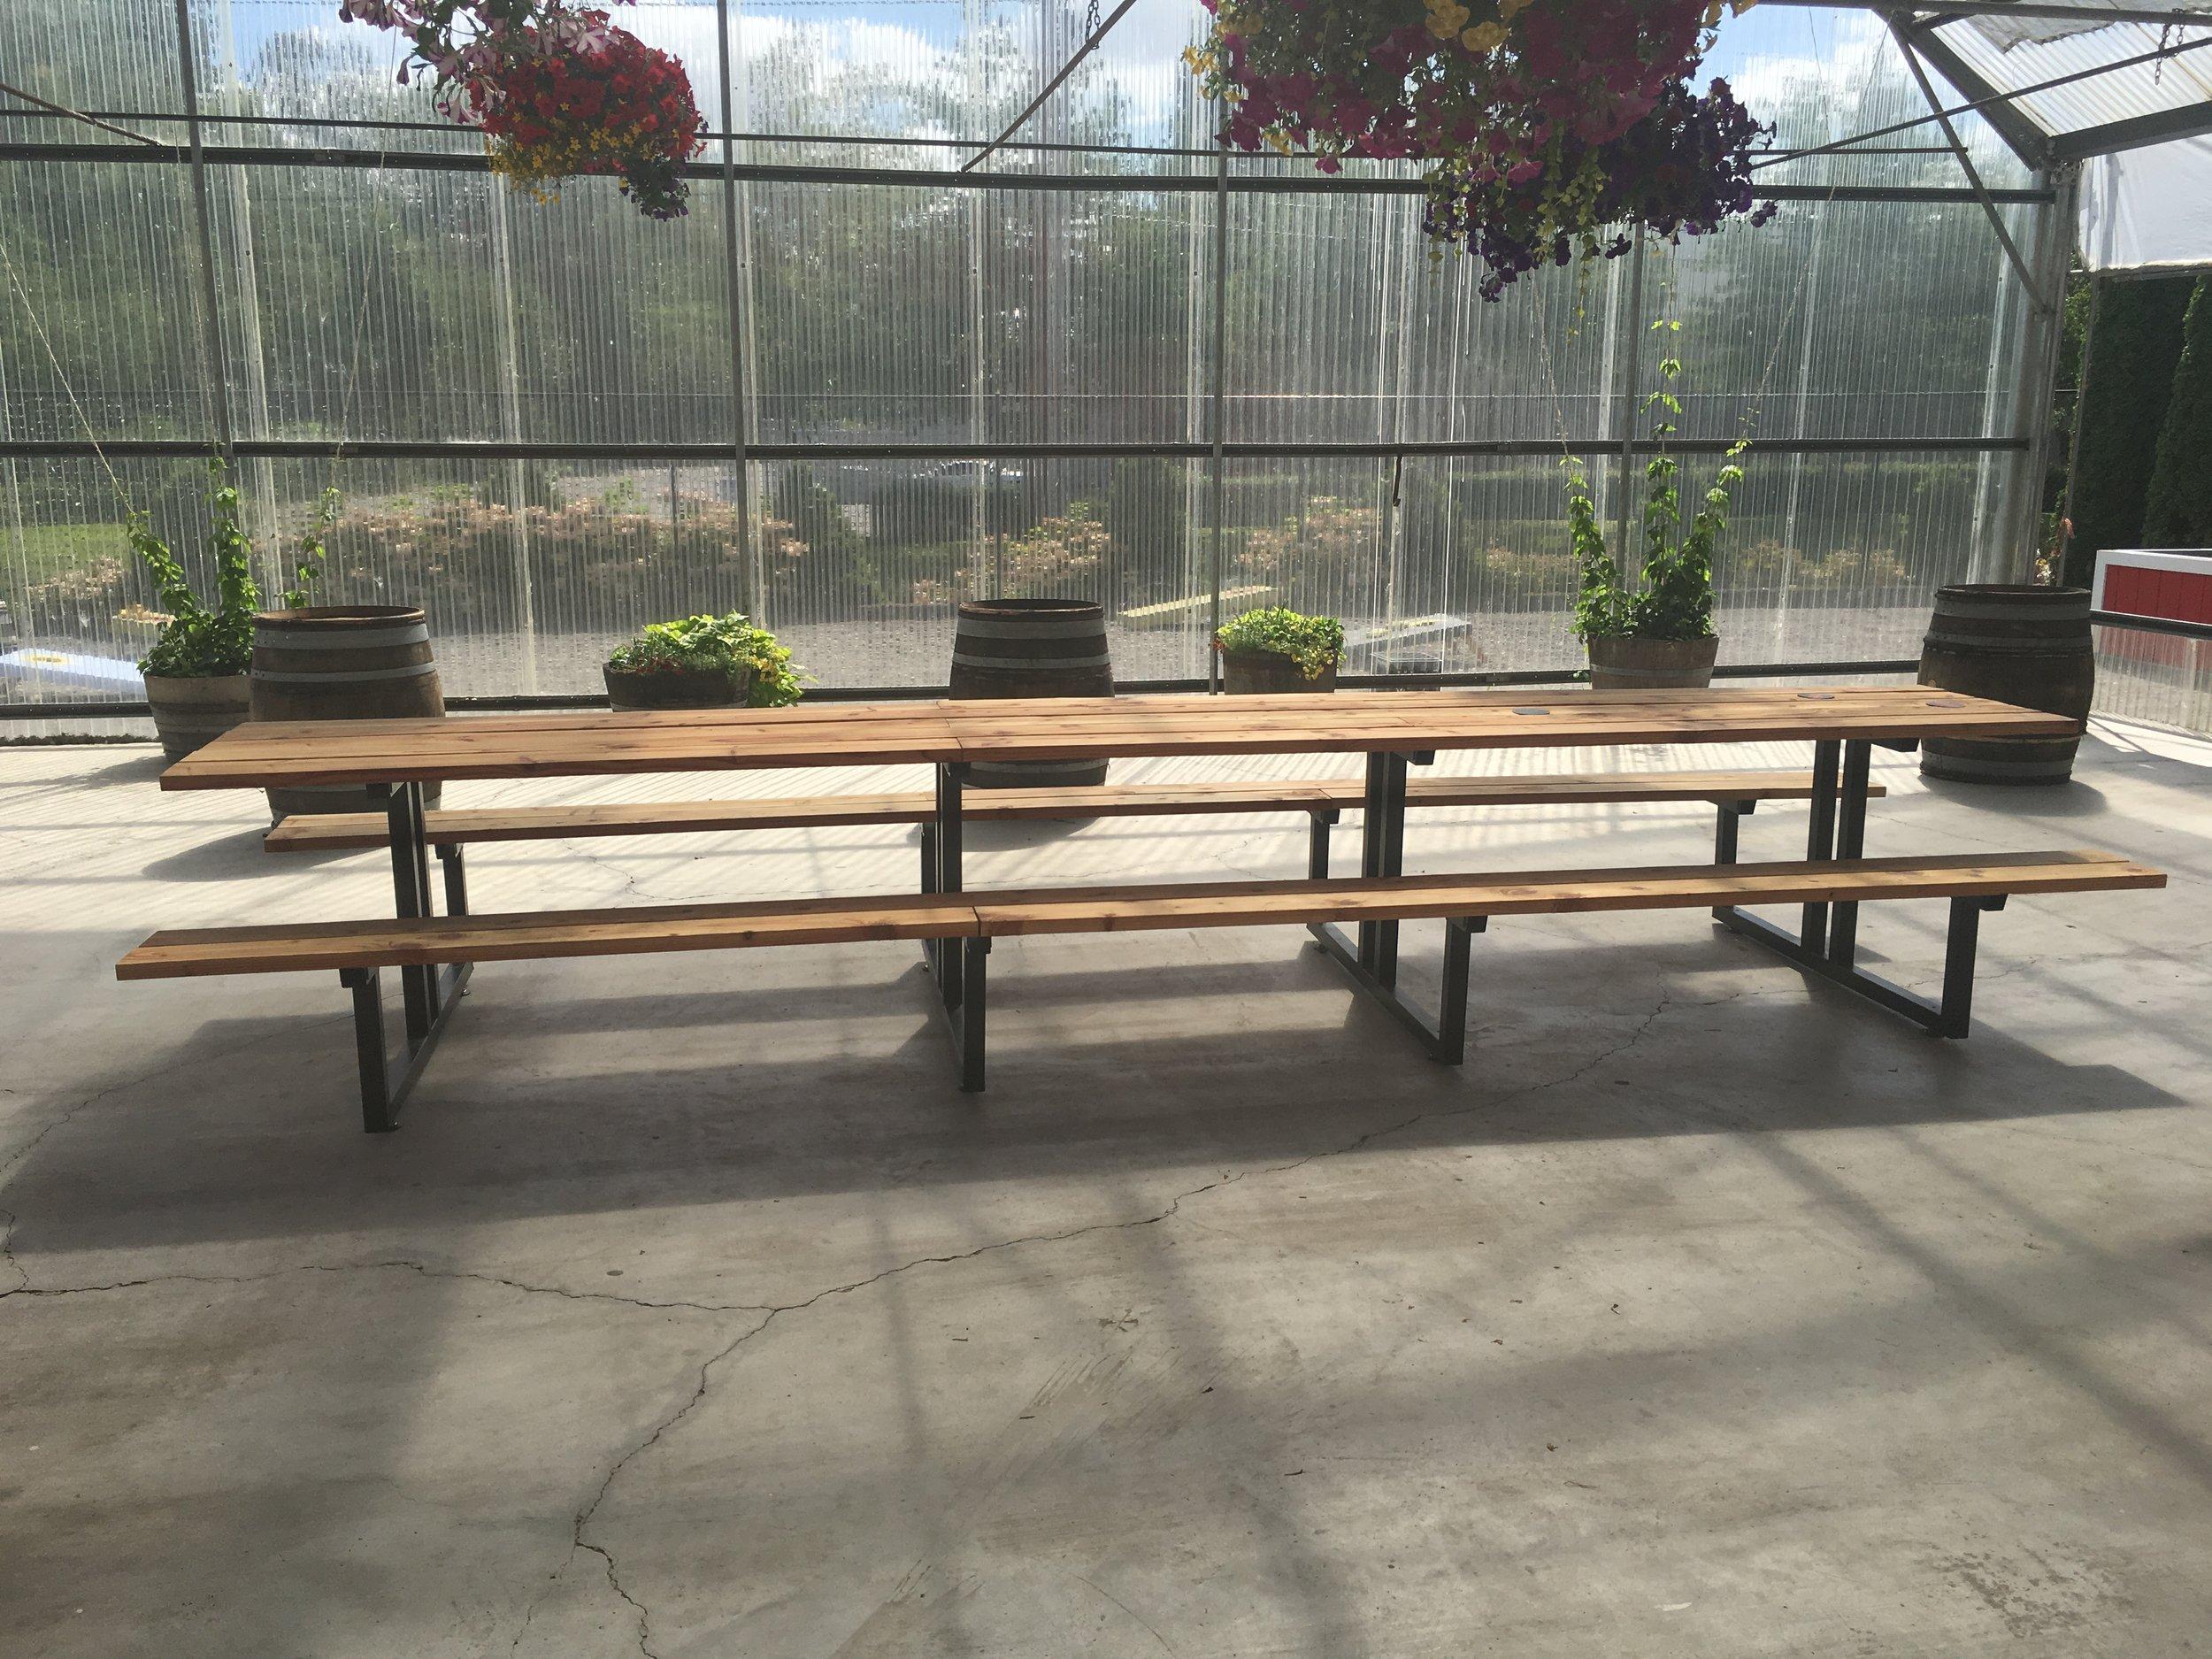 16 foot picnic table